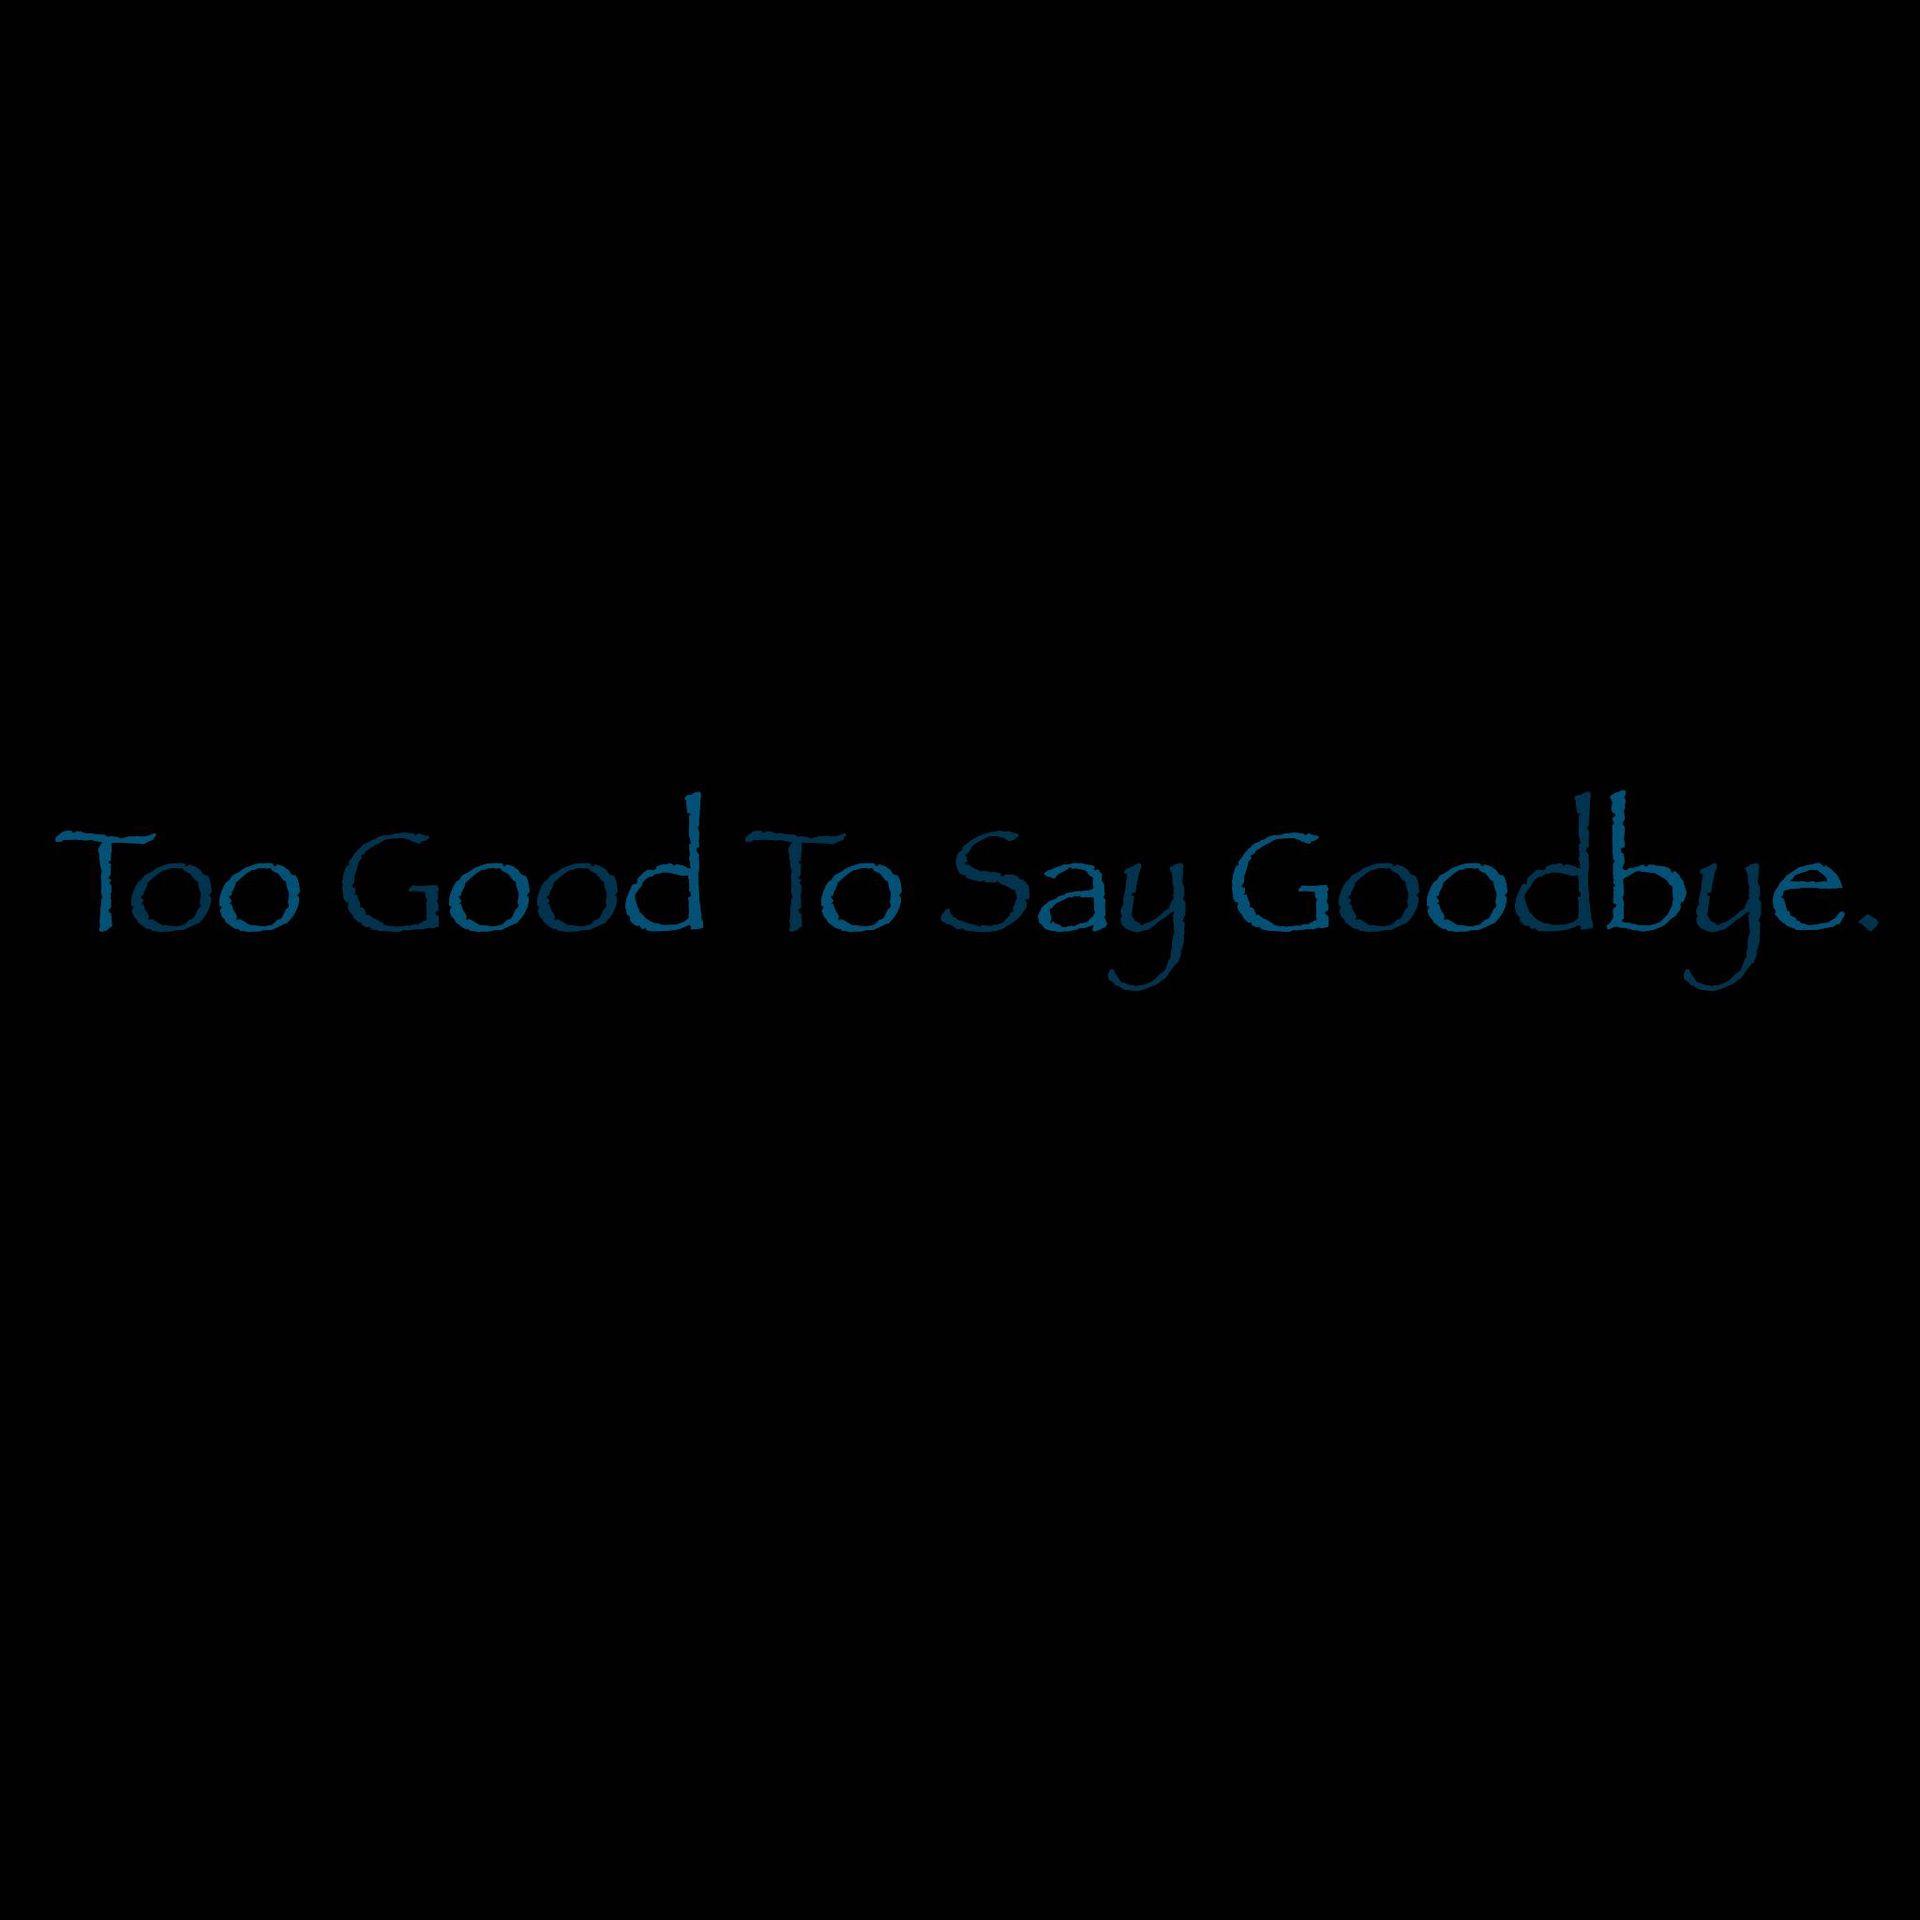 BRUNO MARS' SONGS - Too Good To Say Goodbye - Wattpad